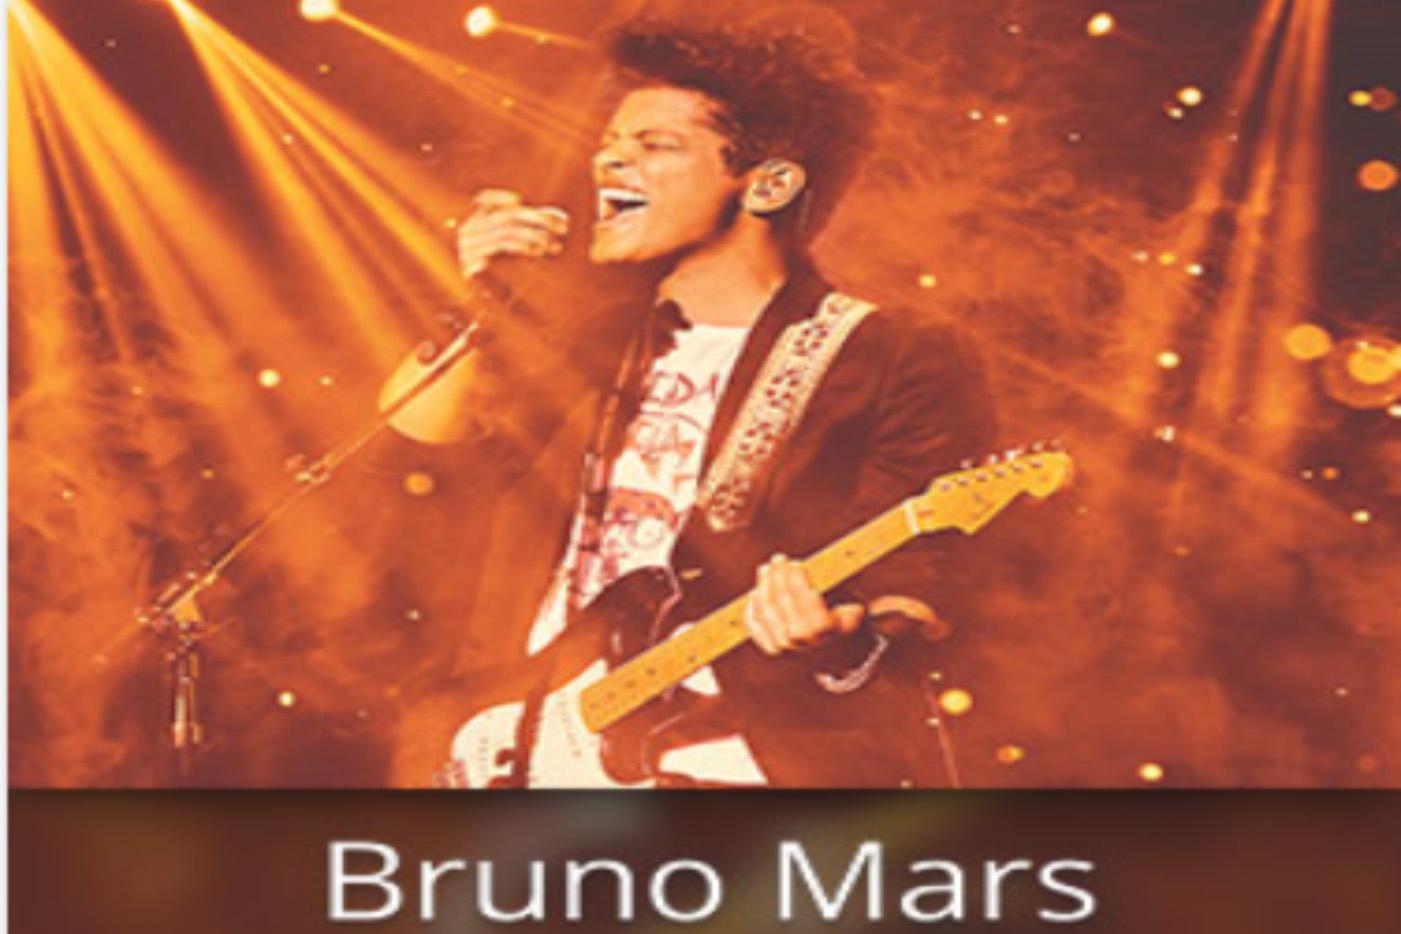 Bruno Mars World Tour Schedule and Tickets - Seat Stubs